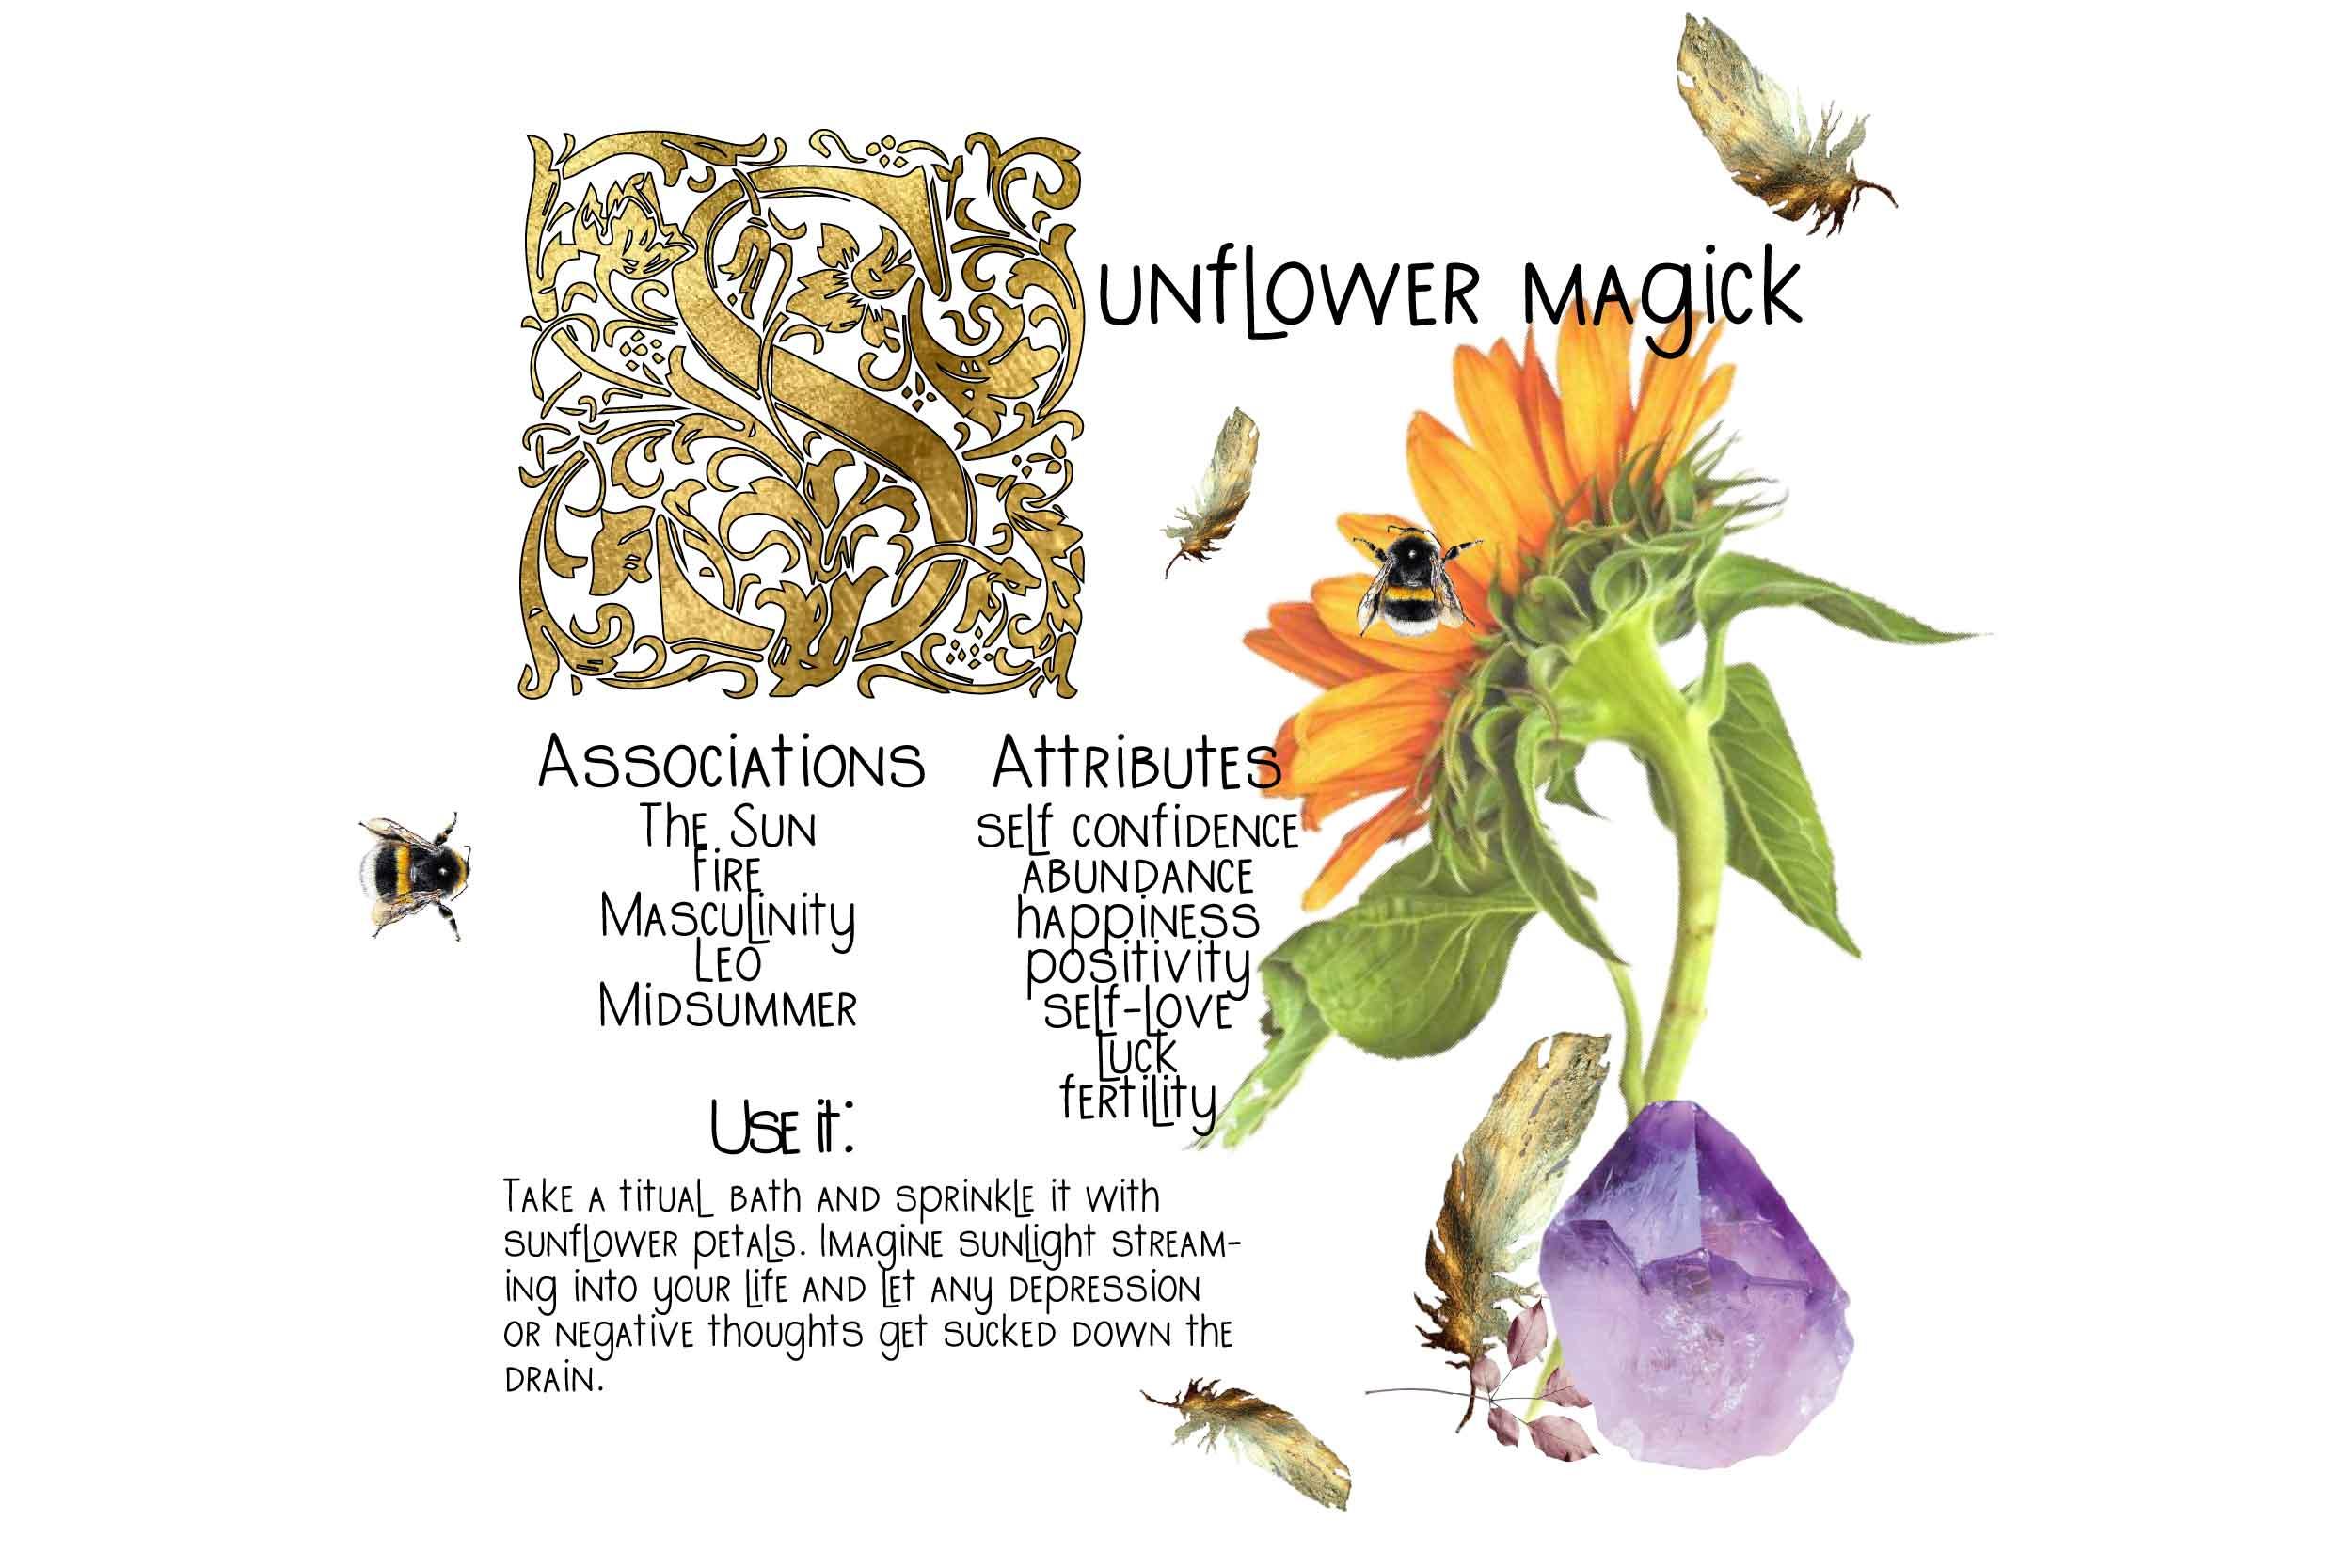 Sunflower Magick